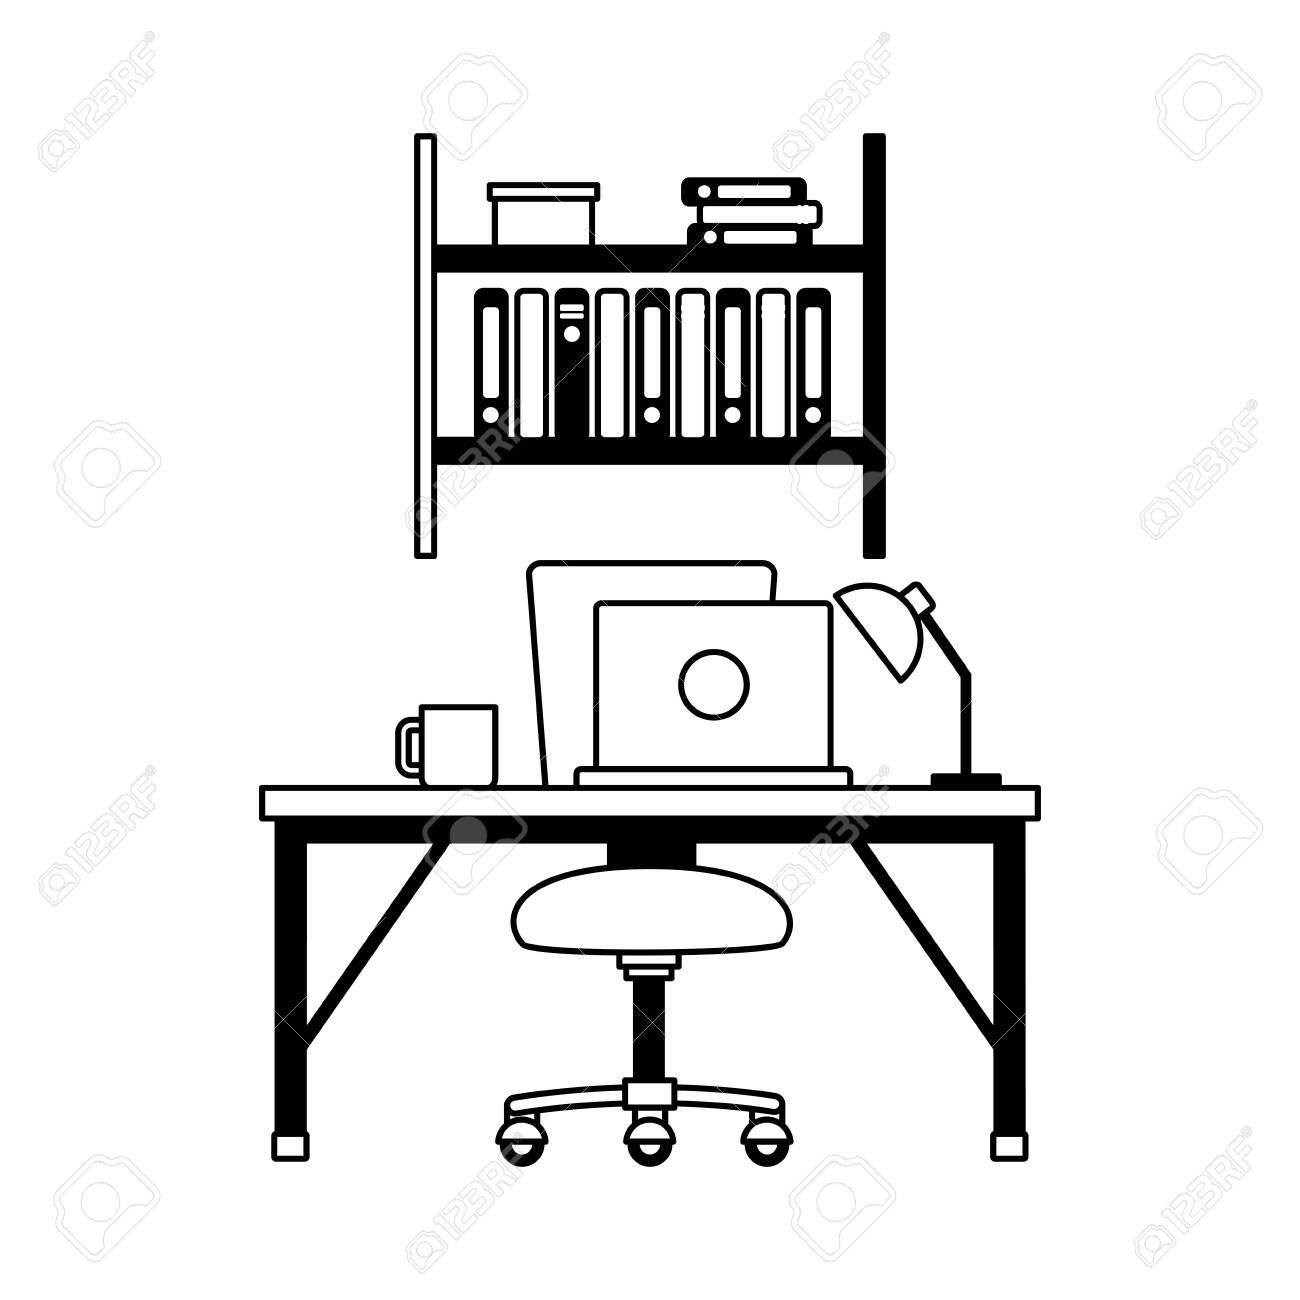 office workplace furniture desk bookshelf vector illustration - 128830500